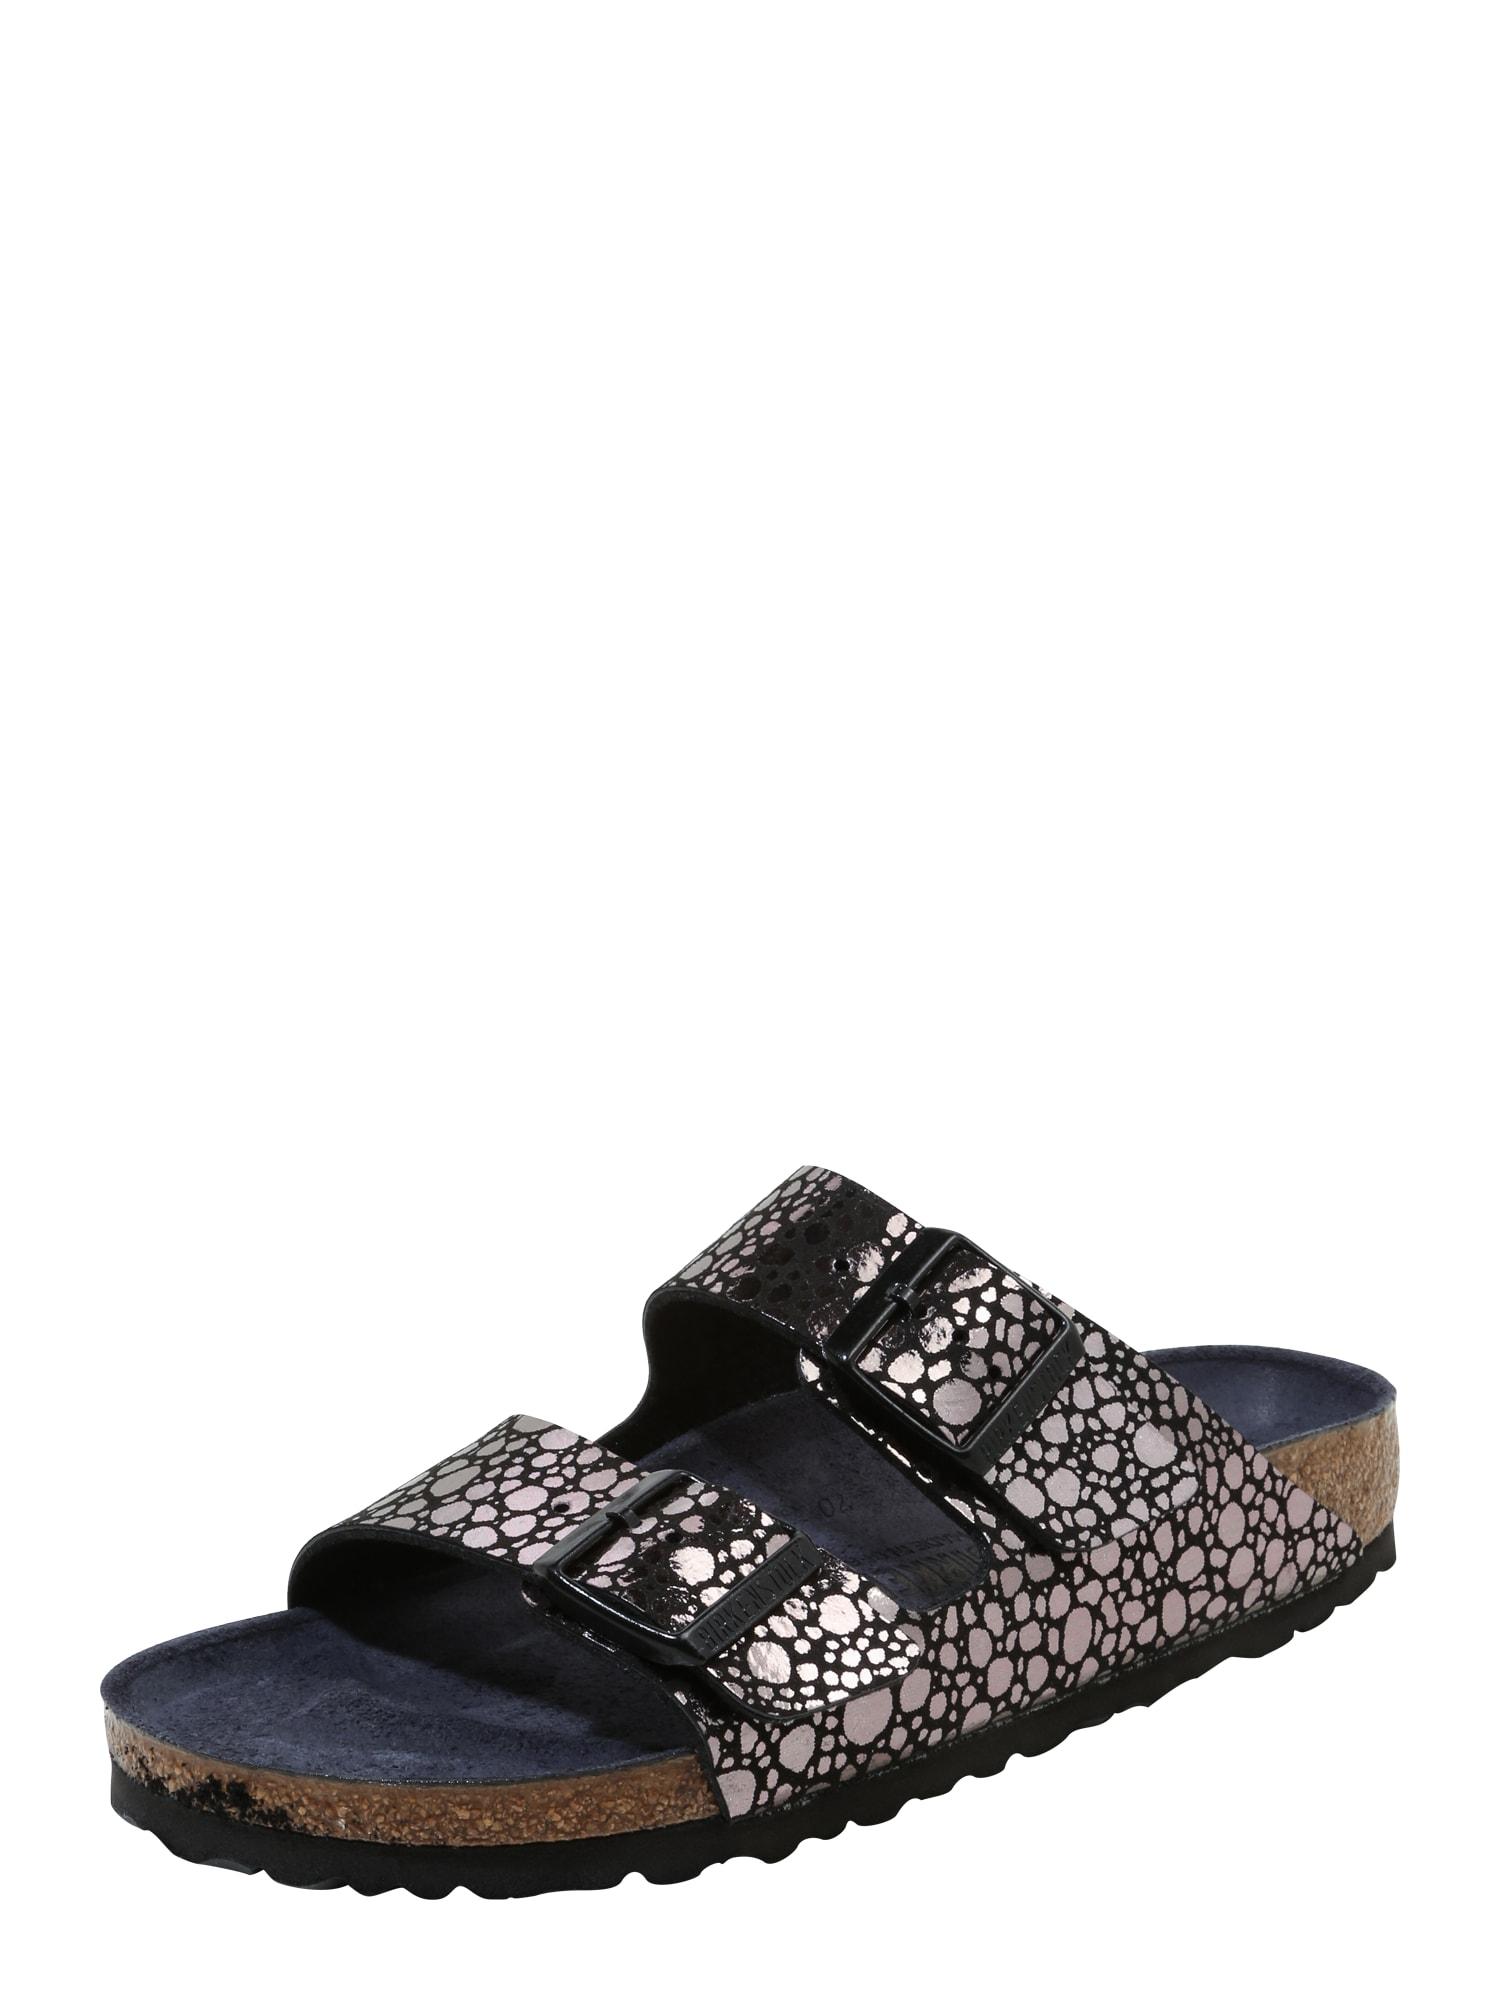 Pantofle Arizona černá stříbrná BIRKENSTOCK